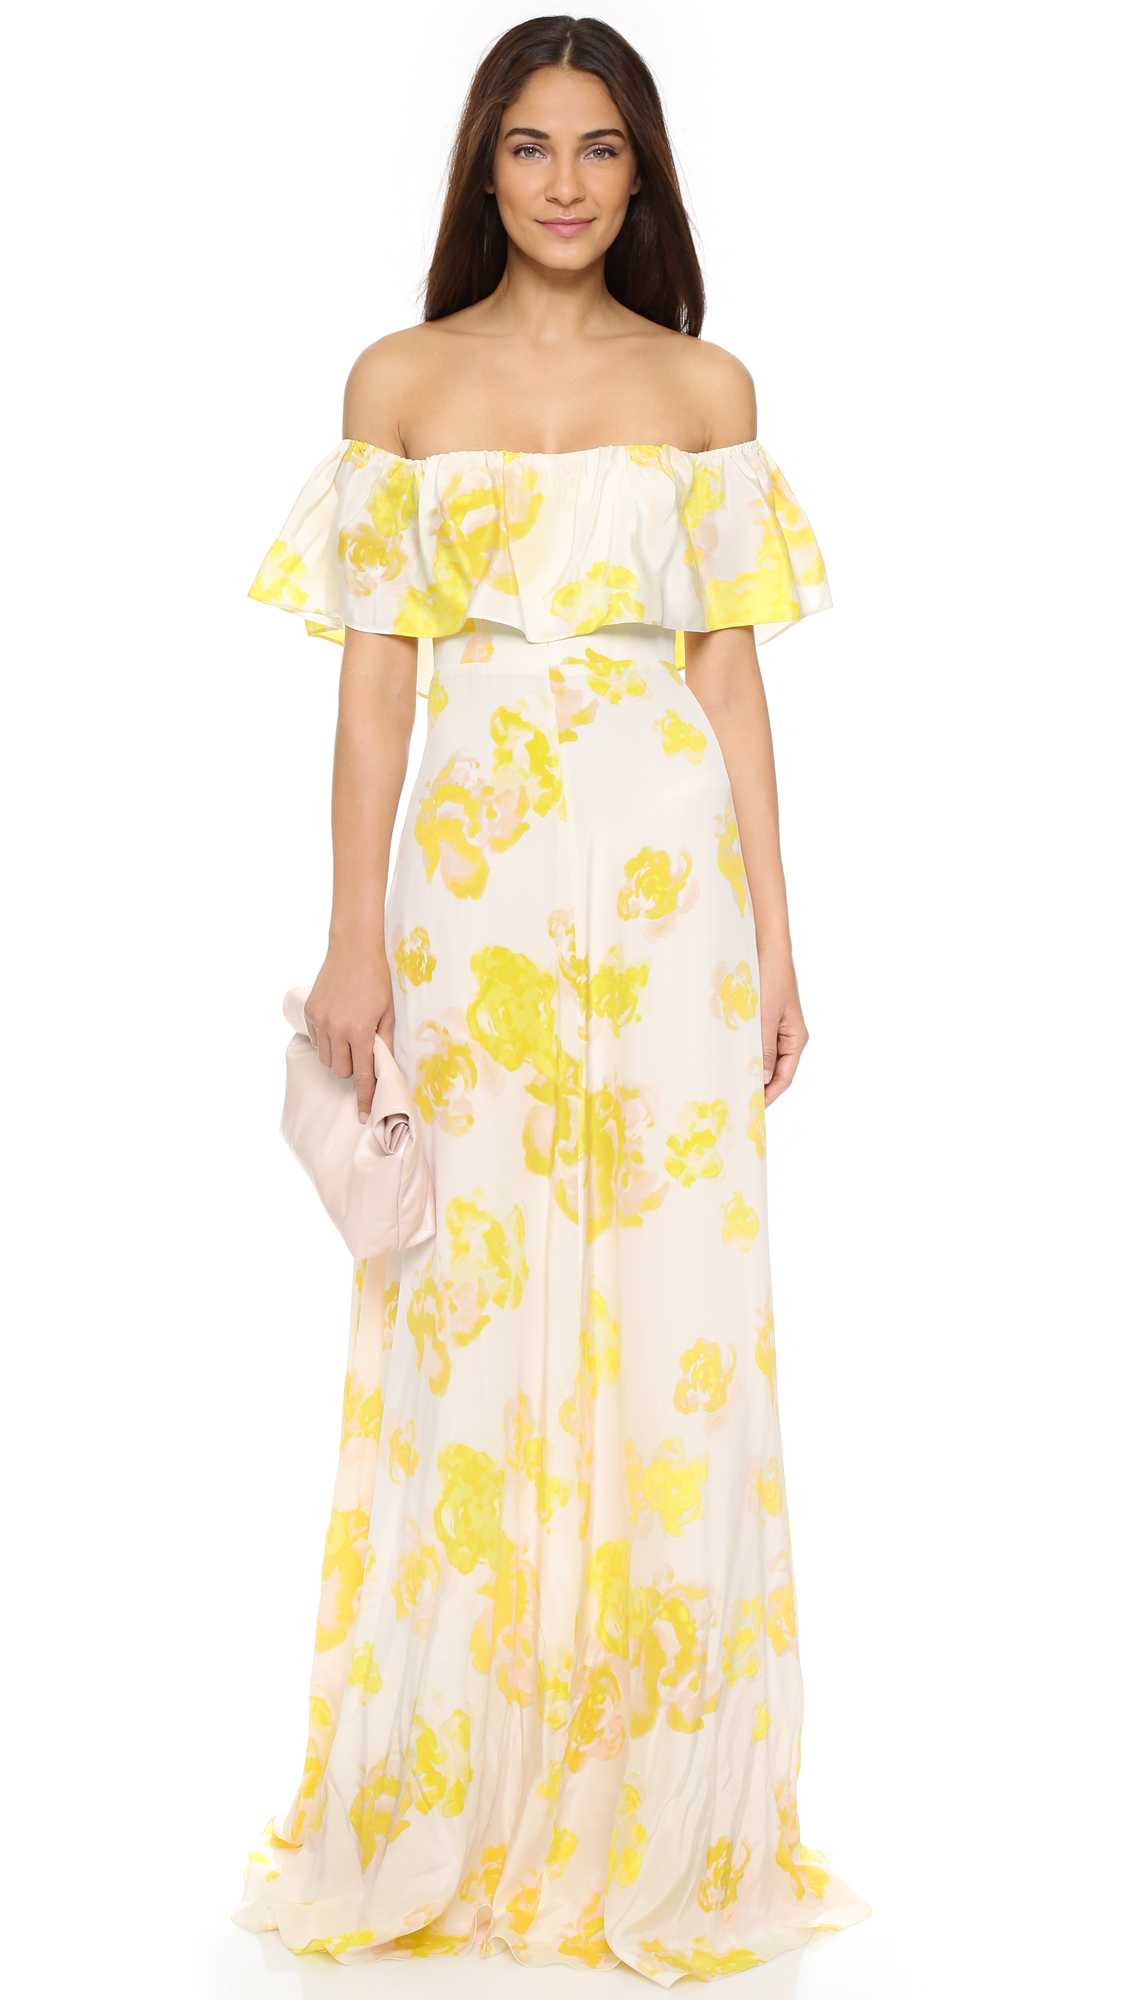 Lyst - Amanda Uprichard Delilah Dress in Yellow